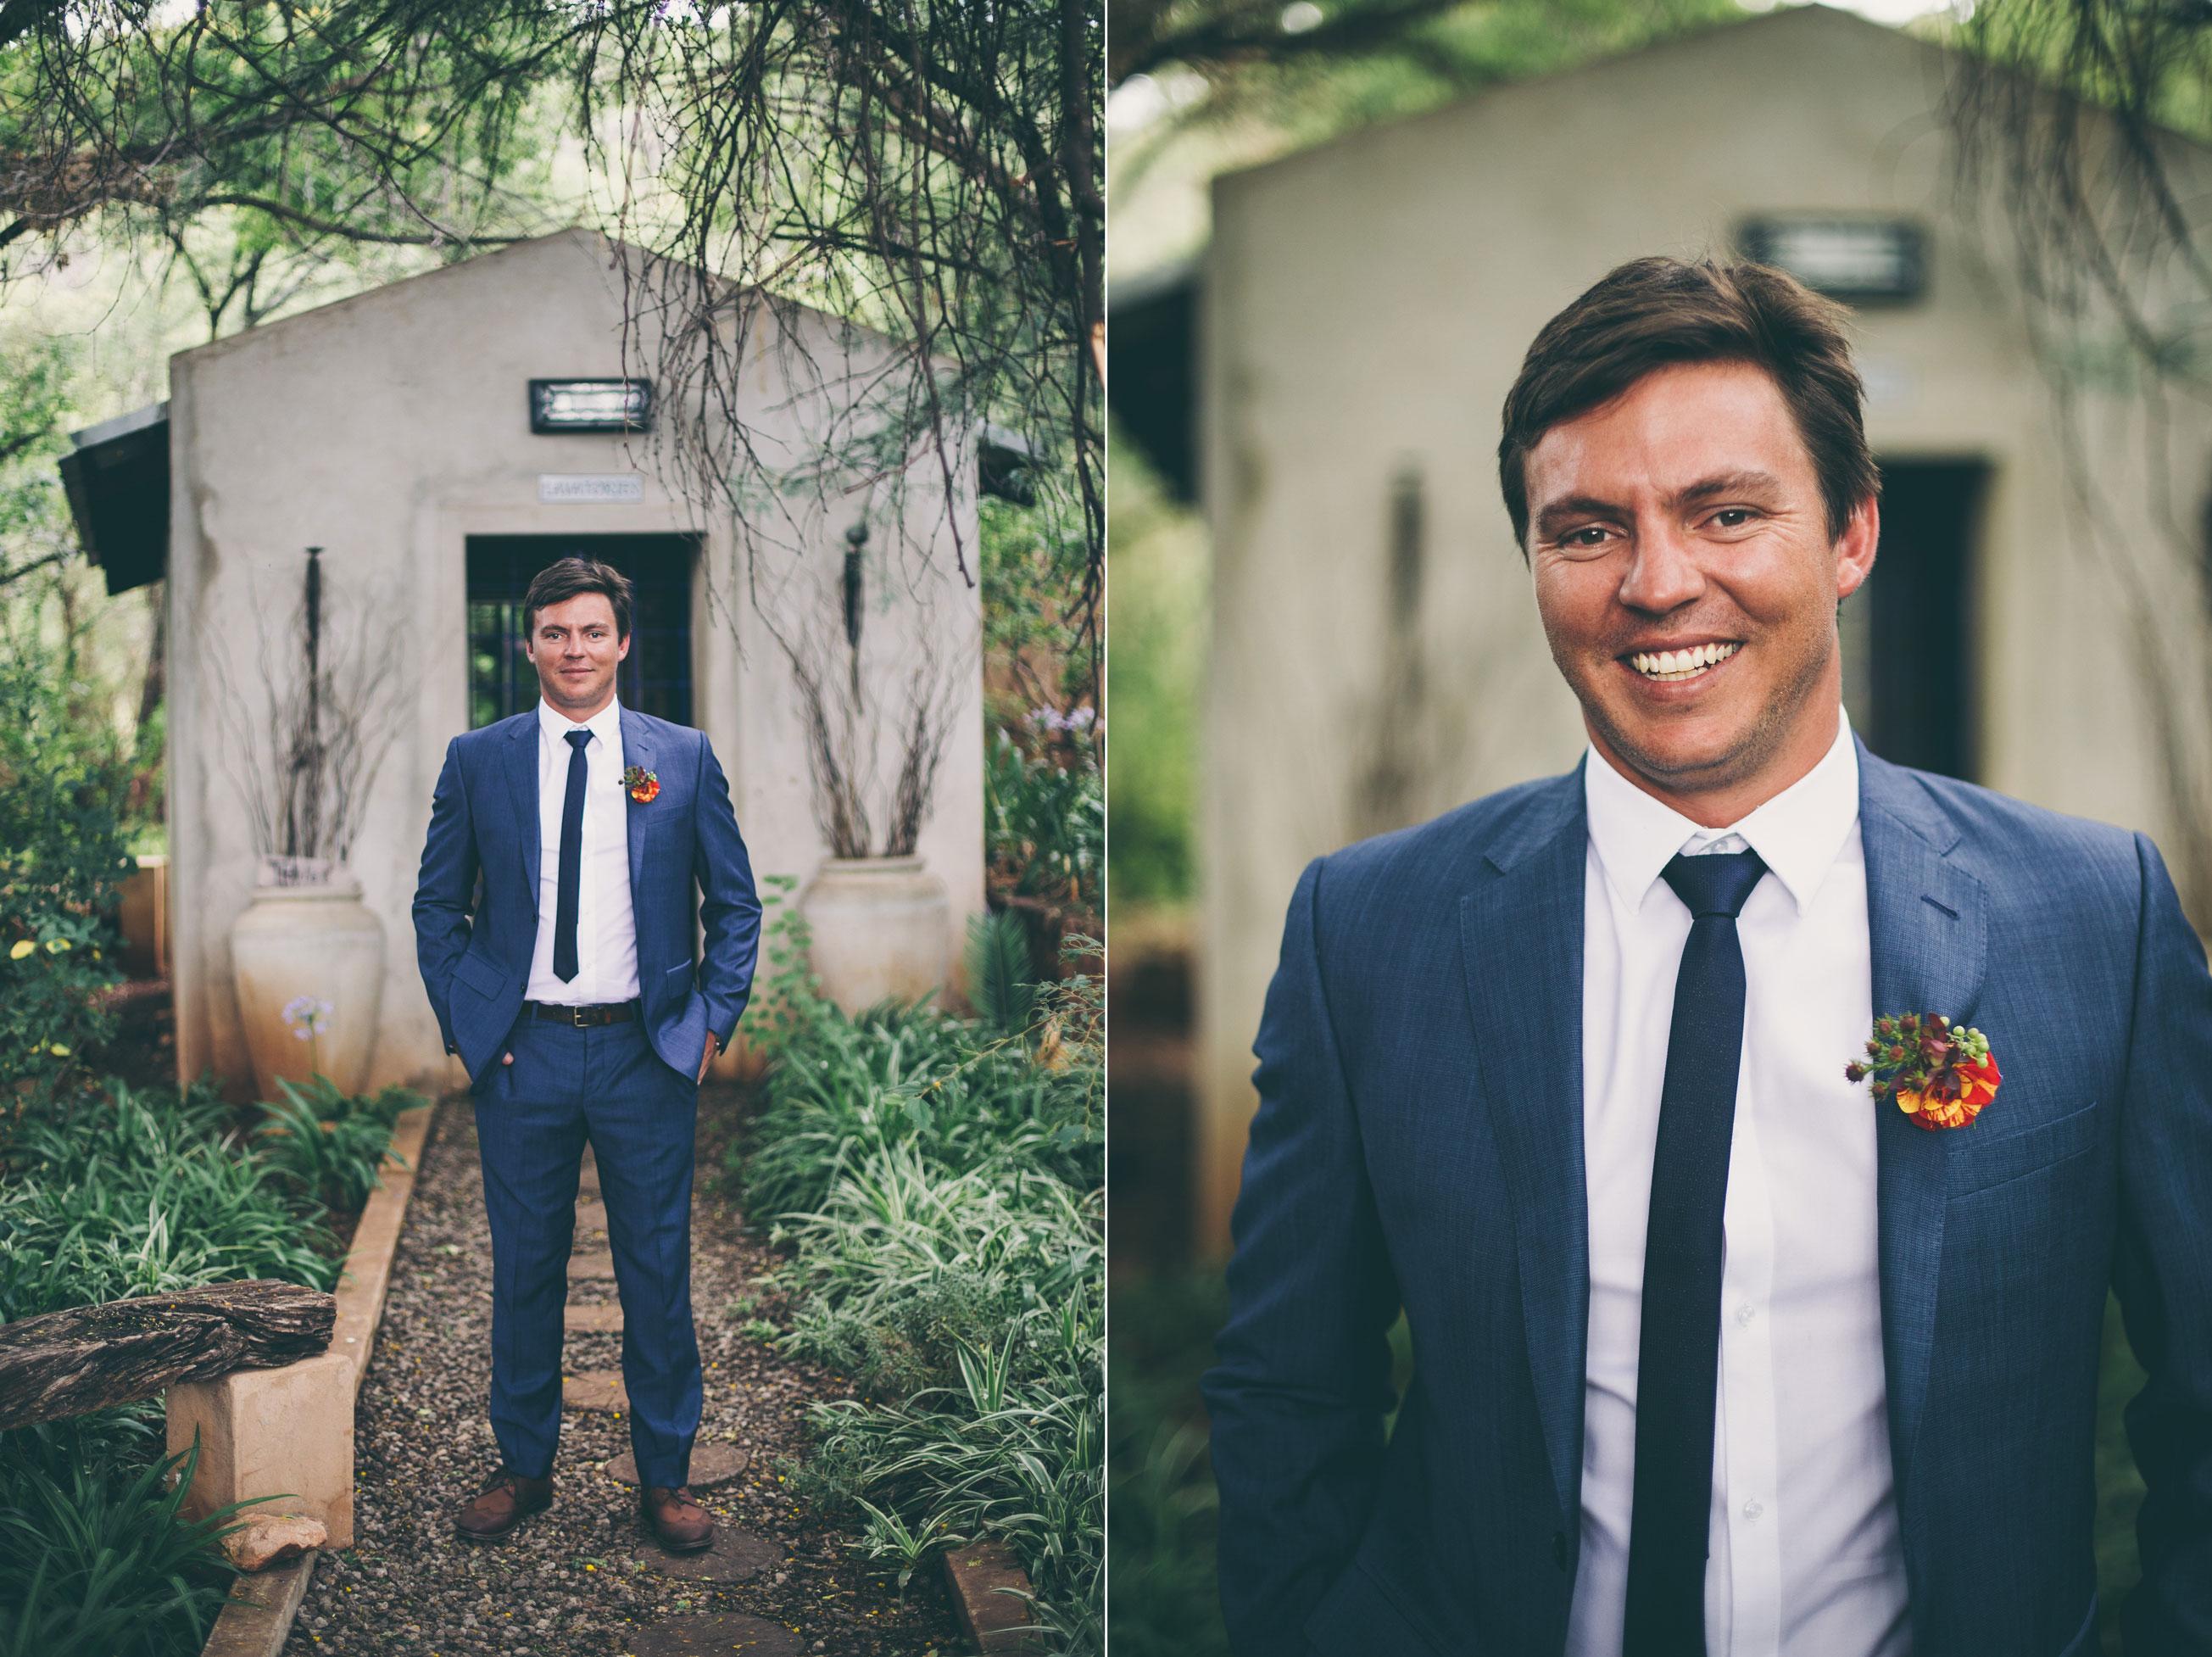 The Nutcracker_Wedding Photography_Maryke Albertyn 13